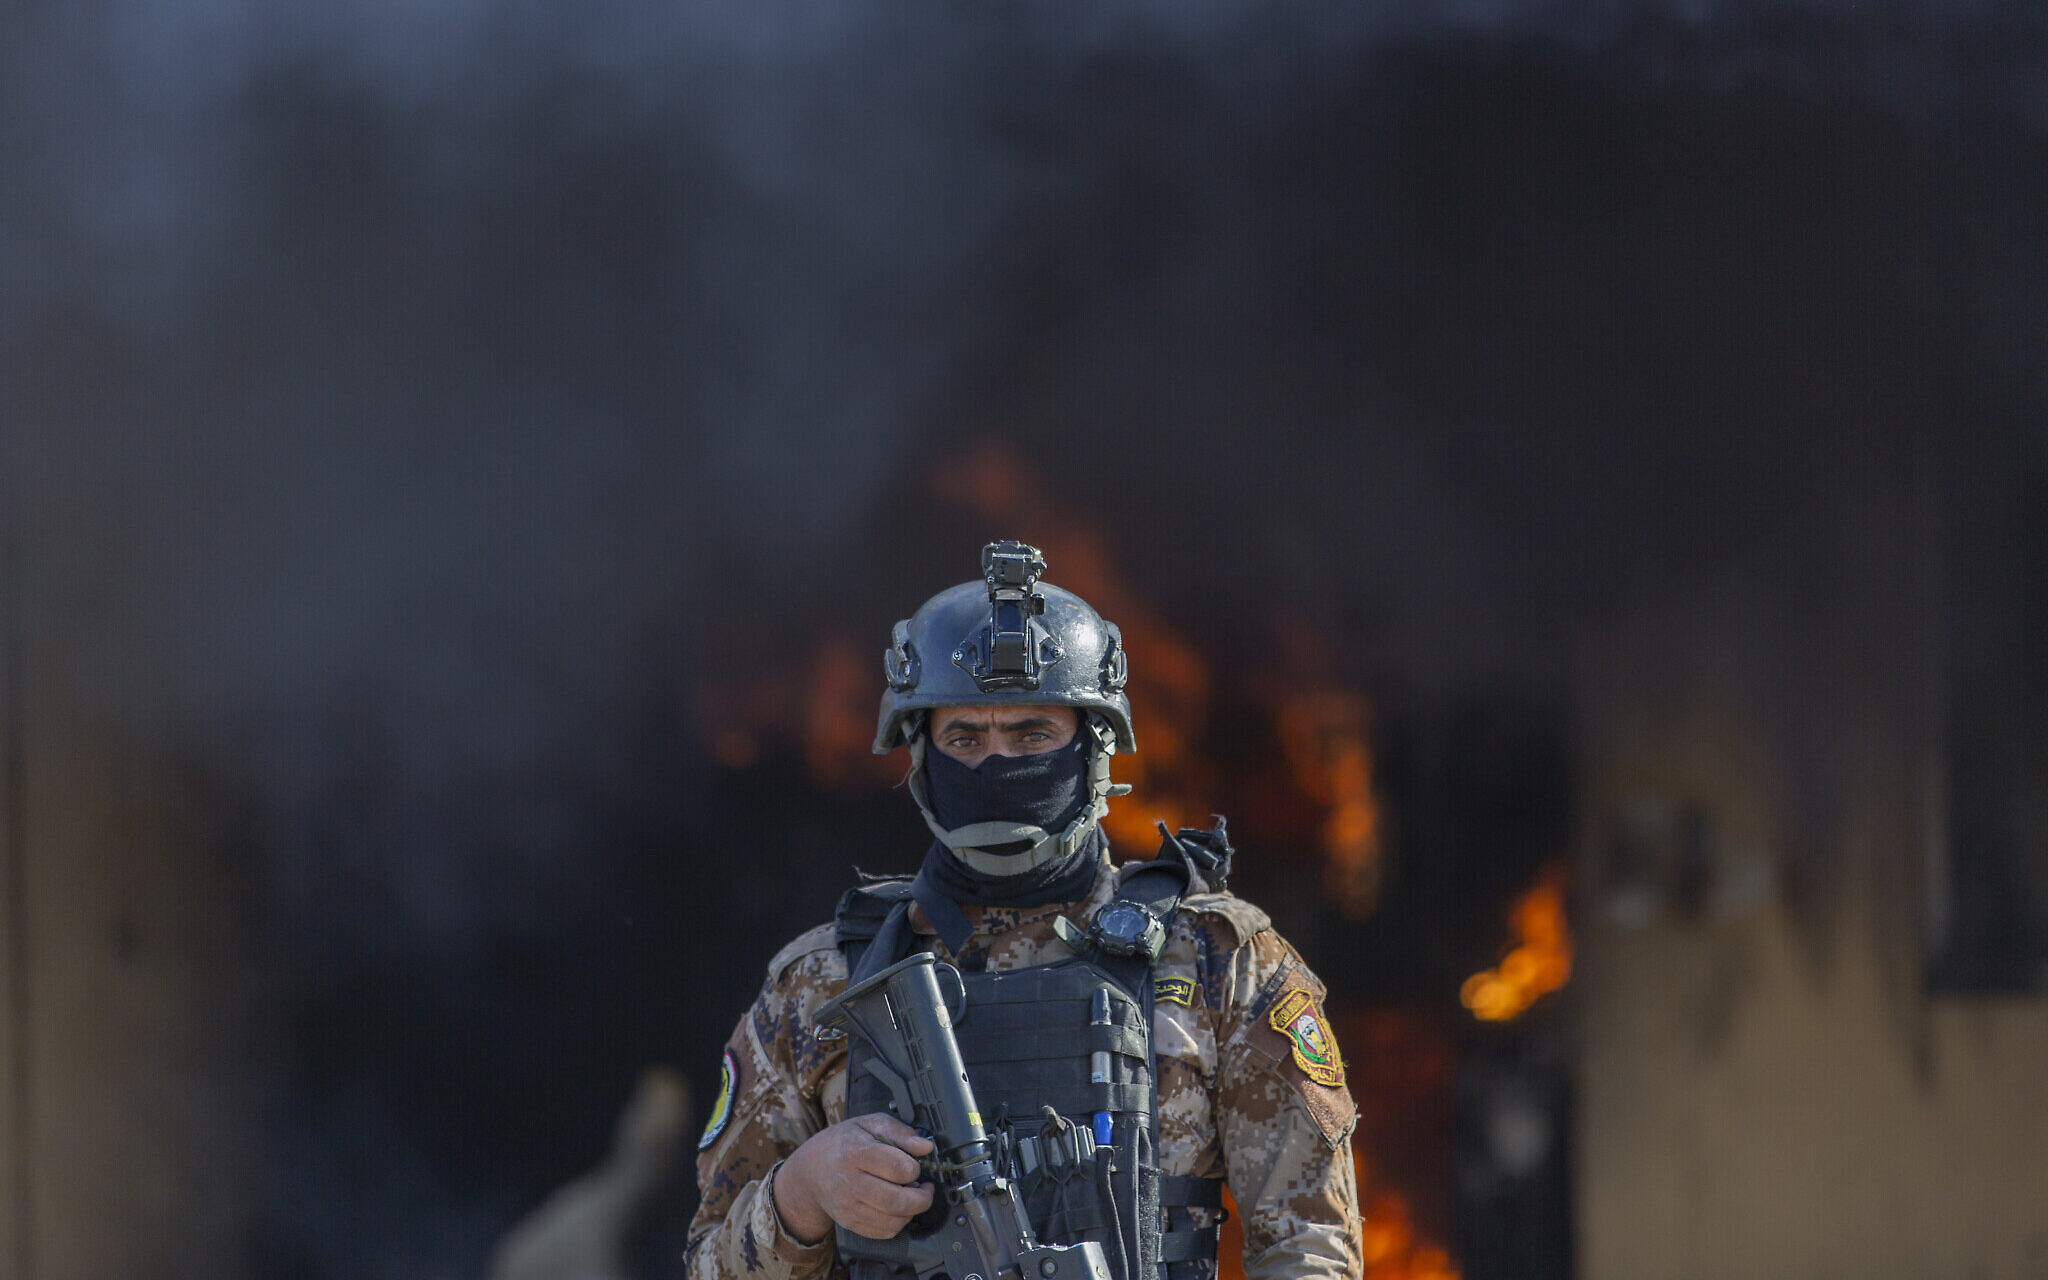 Counter Terrorism in Iraq - ISIS finance chief captured